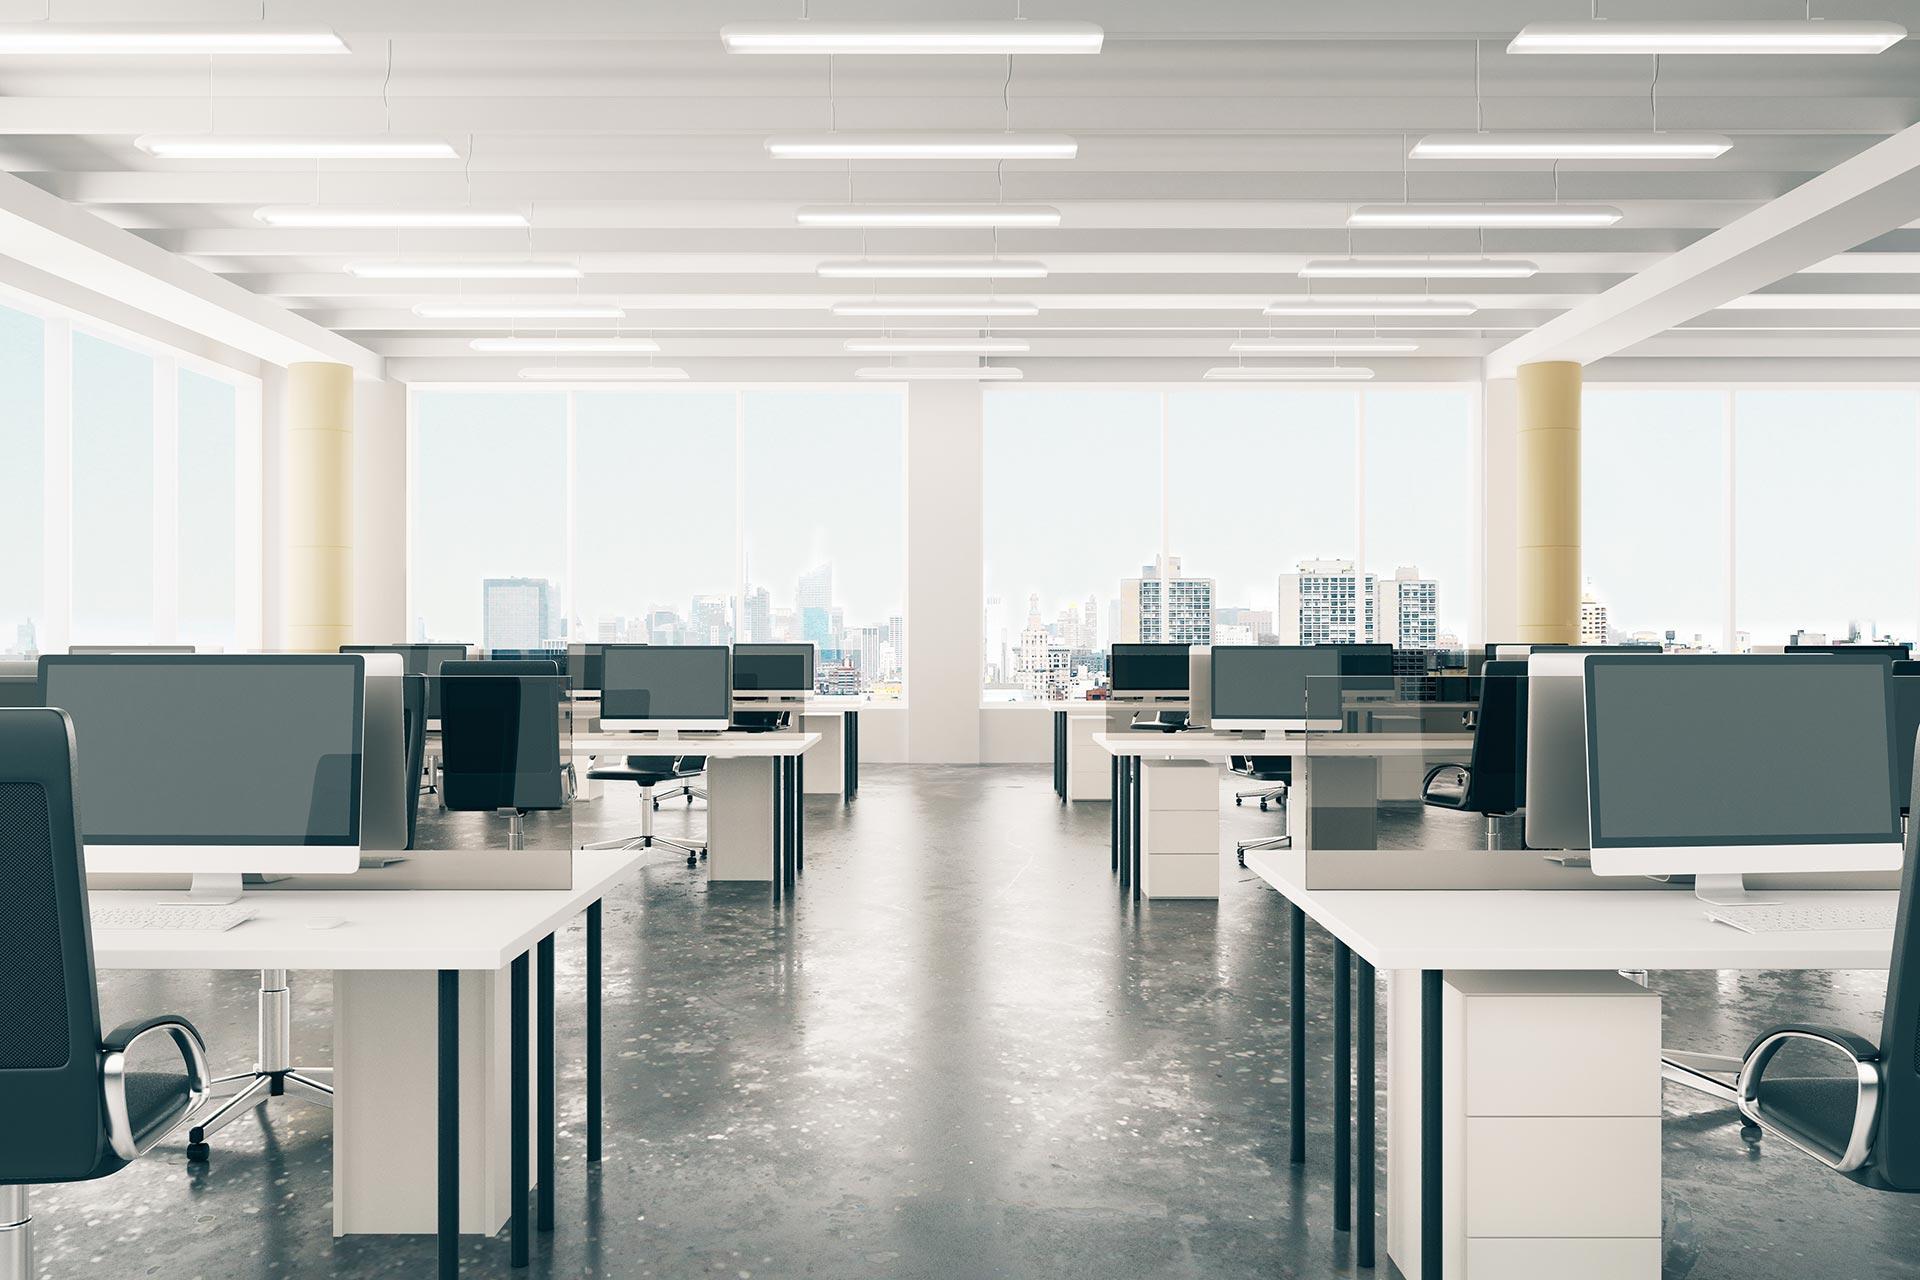 NeoBright: Atlanta Commercial LED Retrofit Lighting   Free Energy Efficiancy Audit & Consulting image 5